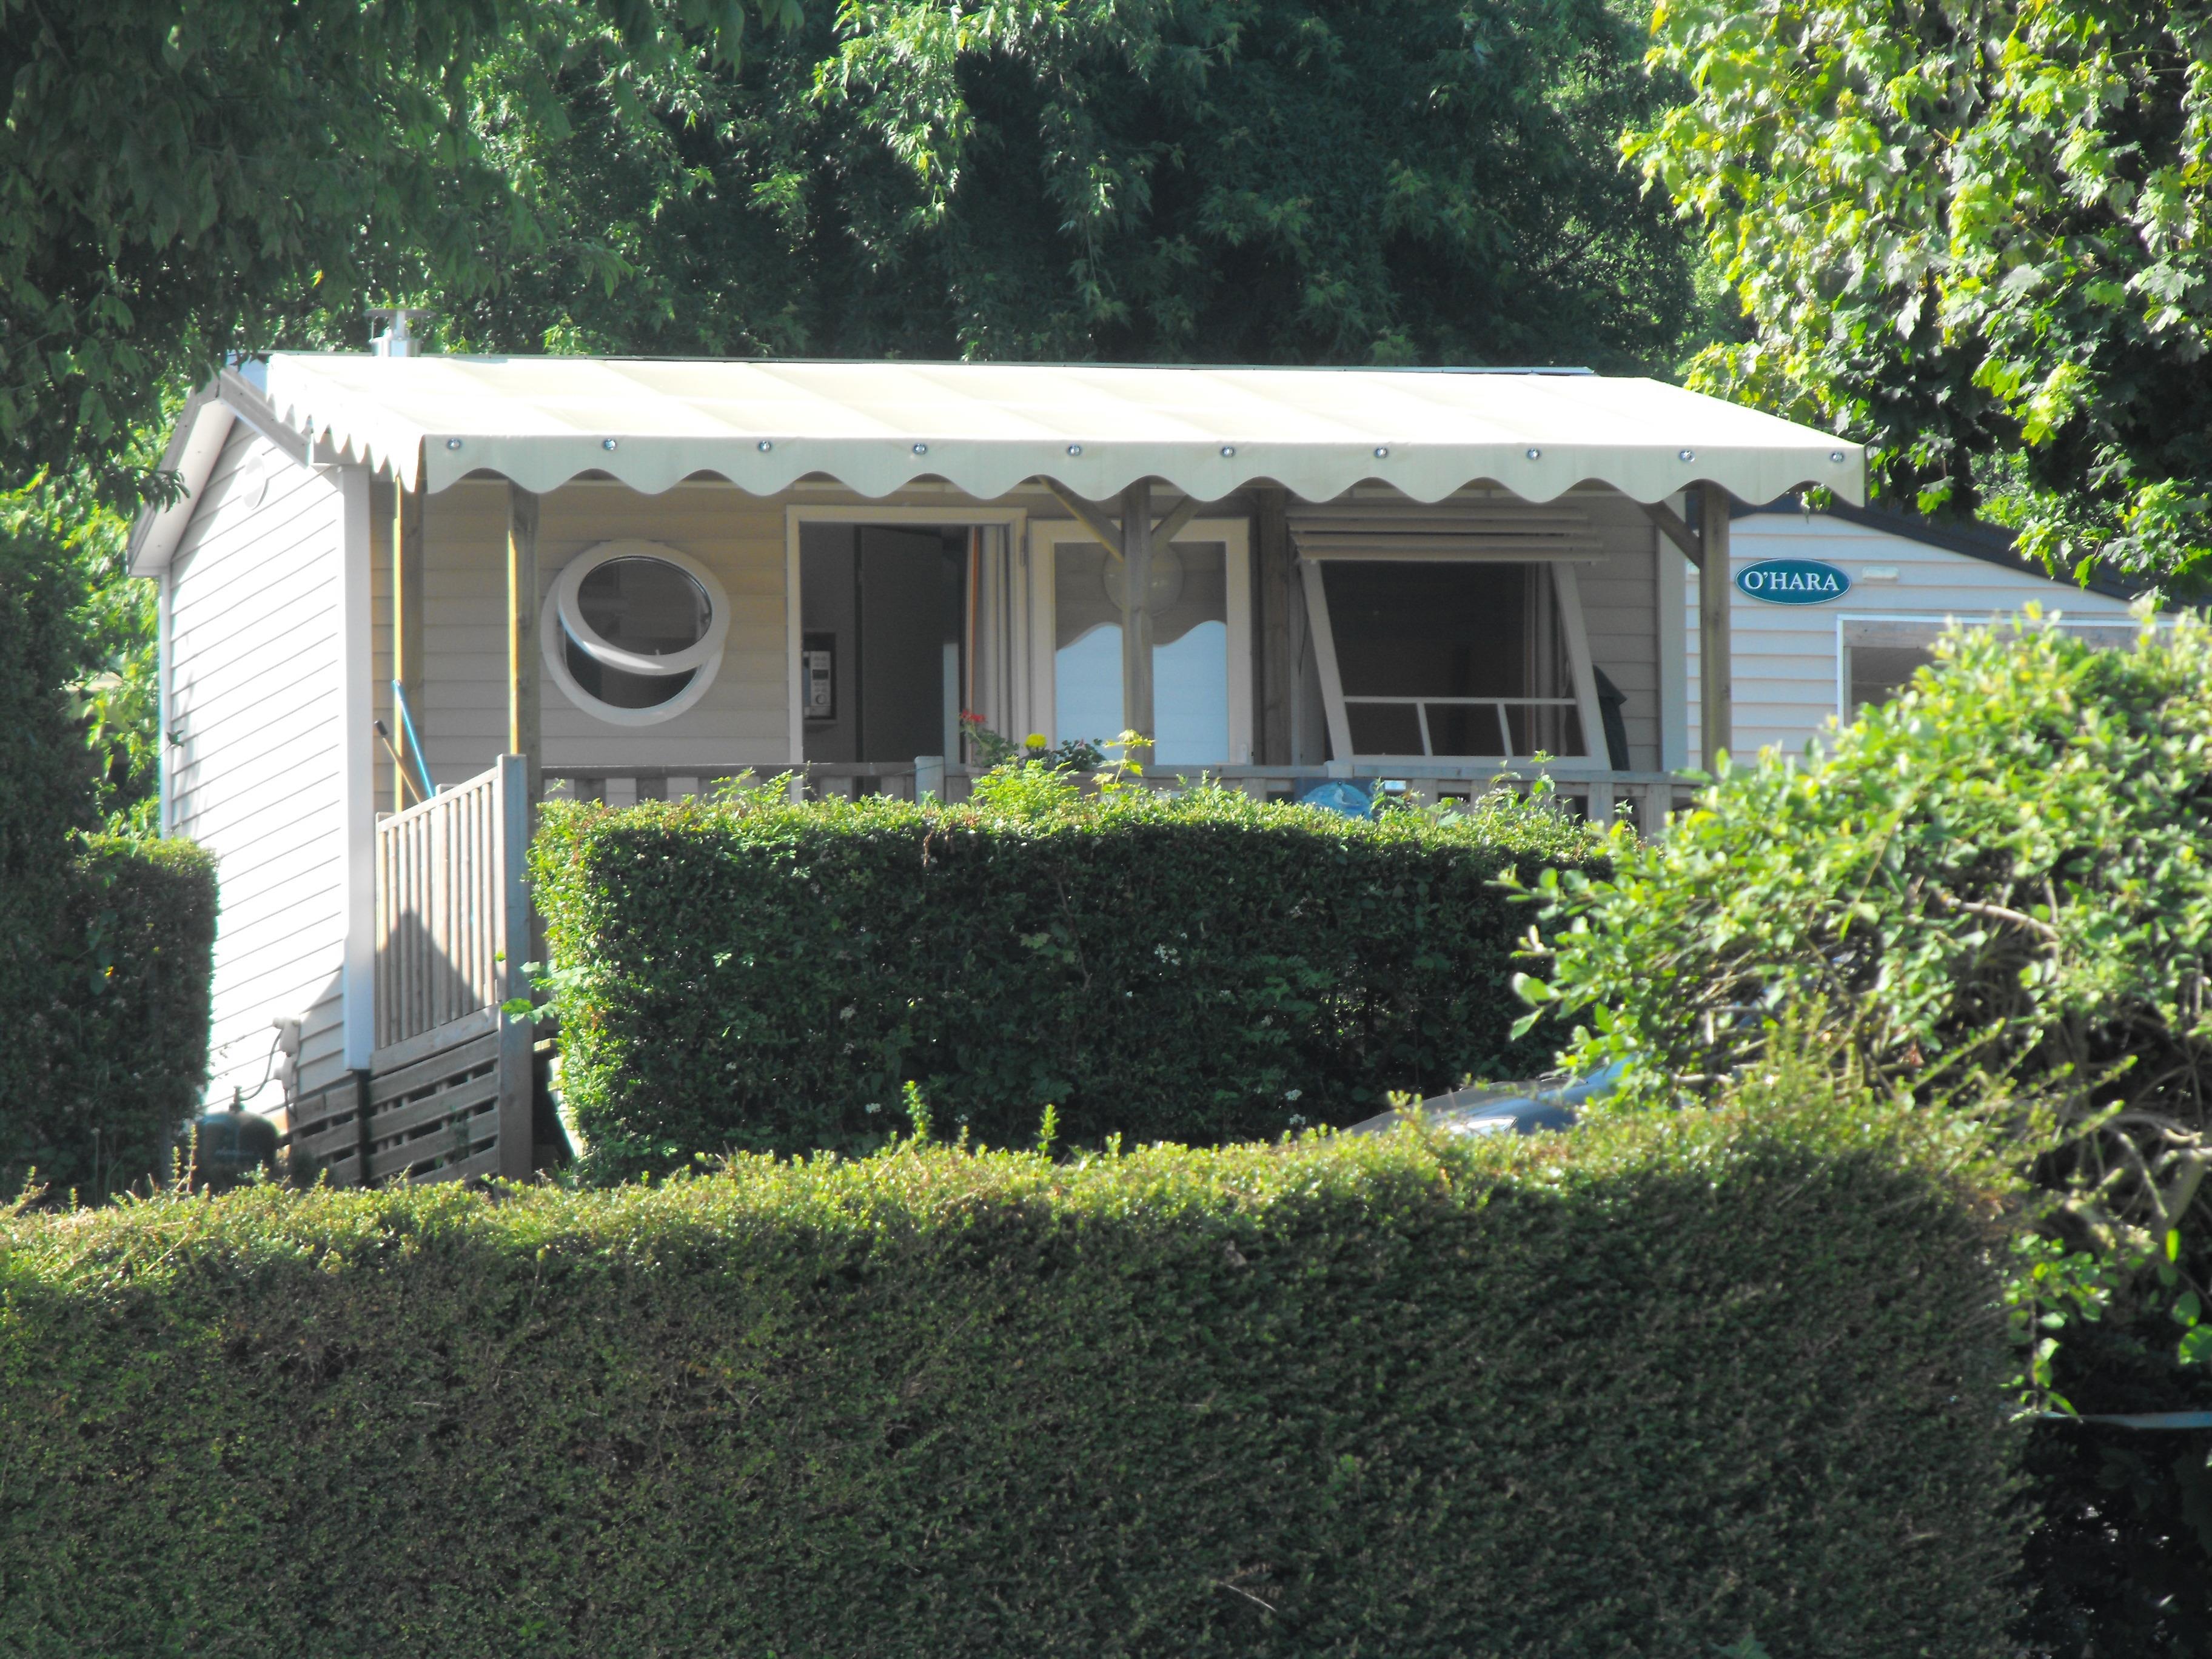 Location - Mobilhome Ohara (1 Chambre) 21.5M² - Camping Vieille Église